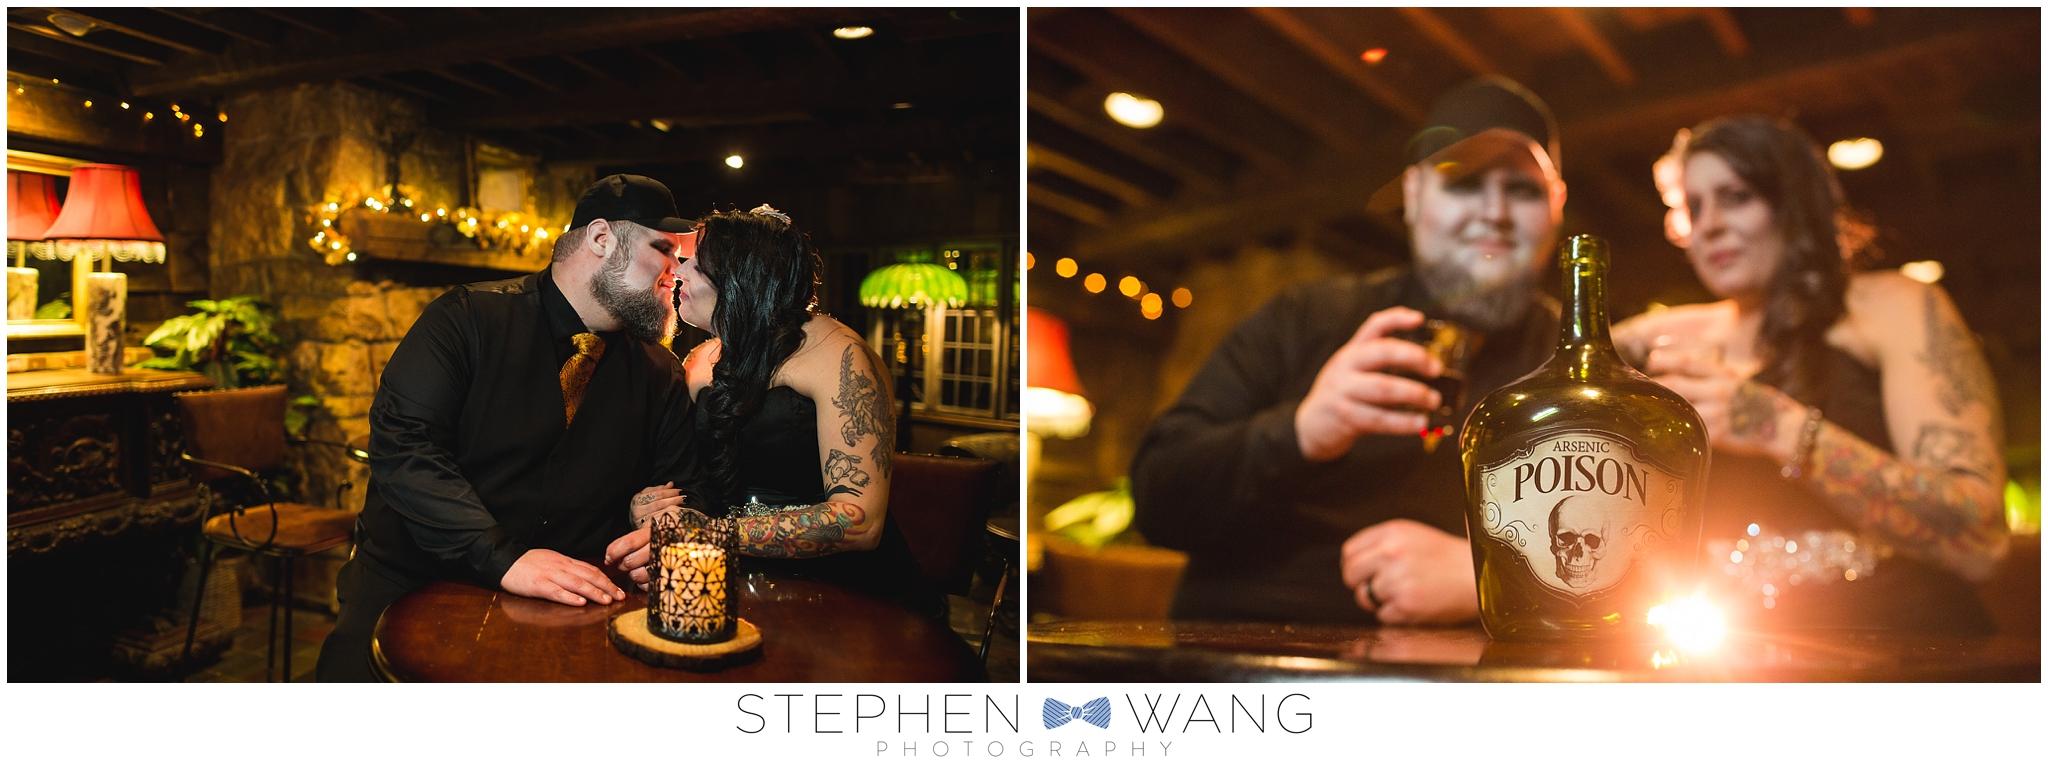 Stephen Wang Photography Wedding Connecticut CT Bill Miller's Castle Branford CT Halloween New England Wedding New Haven-12-02_0027.jpg